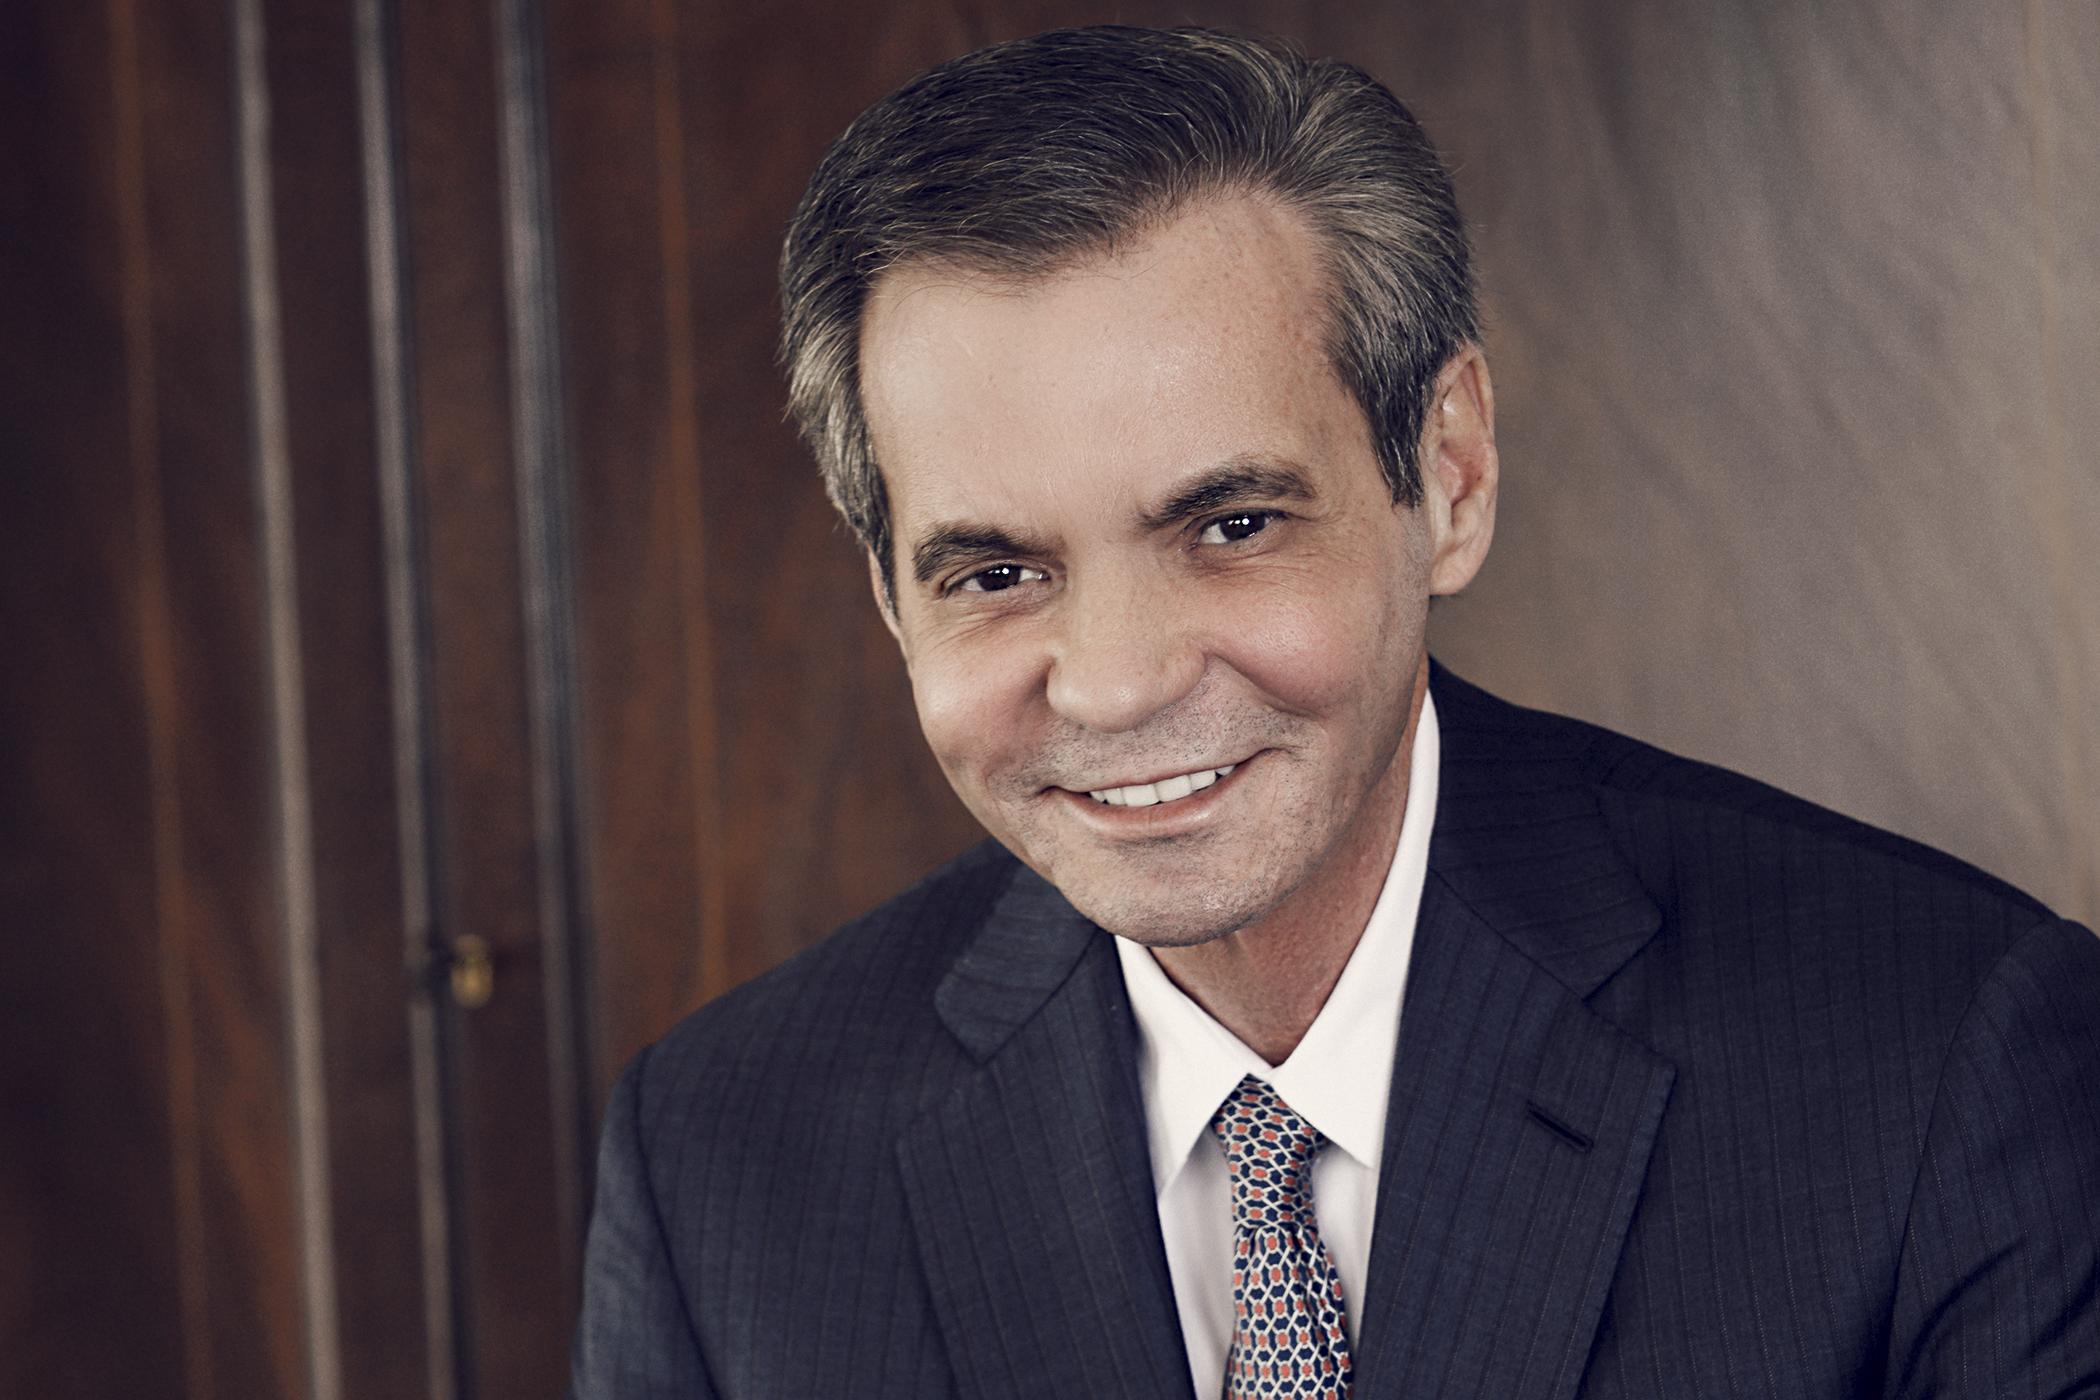 Richard A Gonzalez, AbbVie